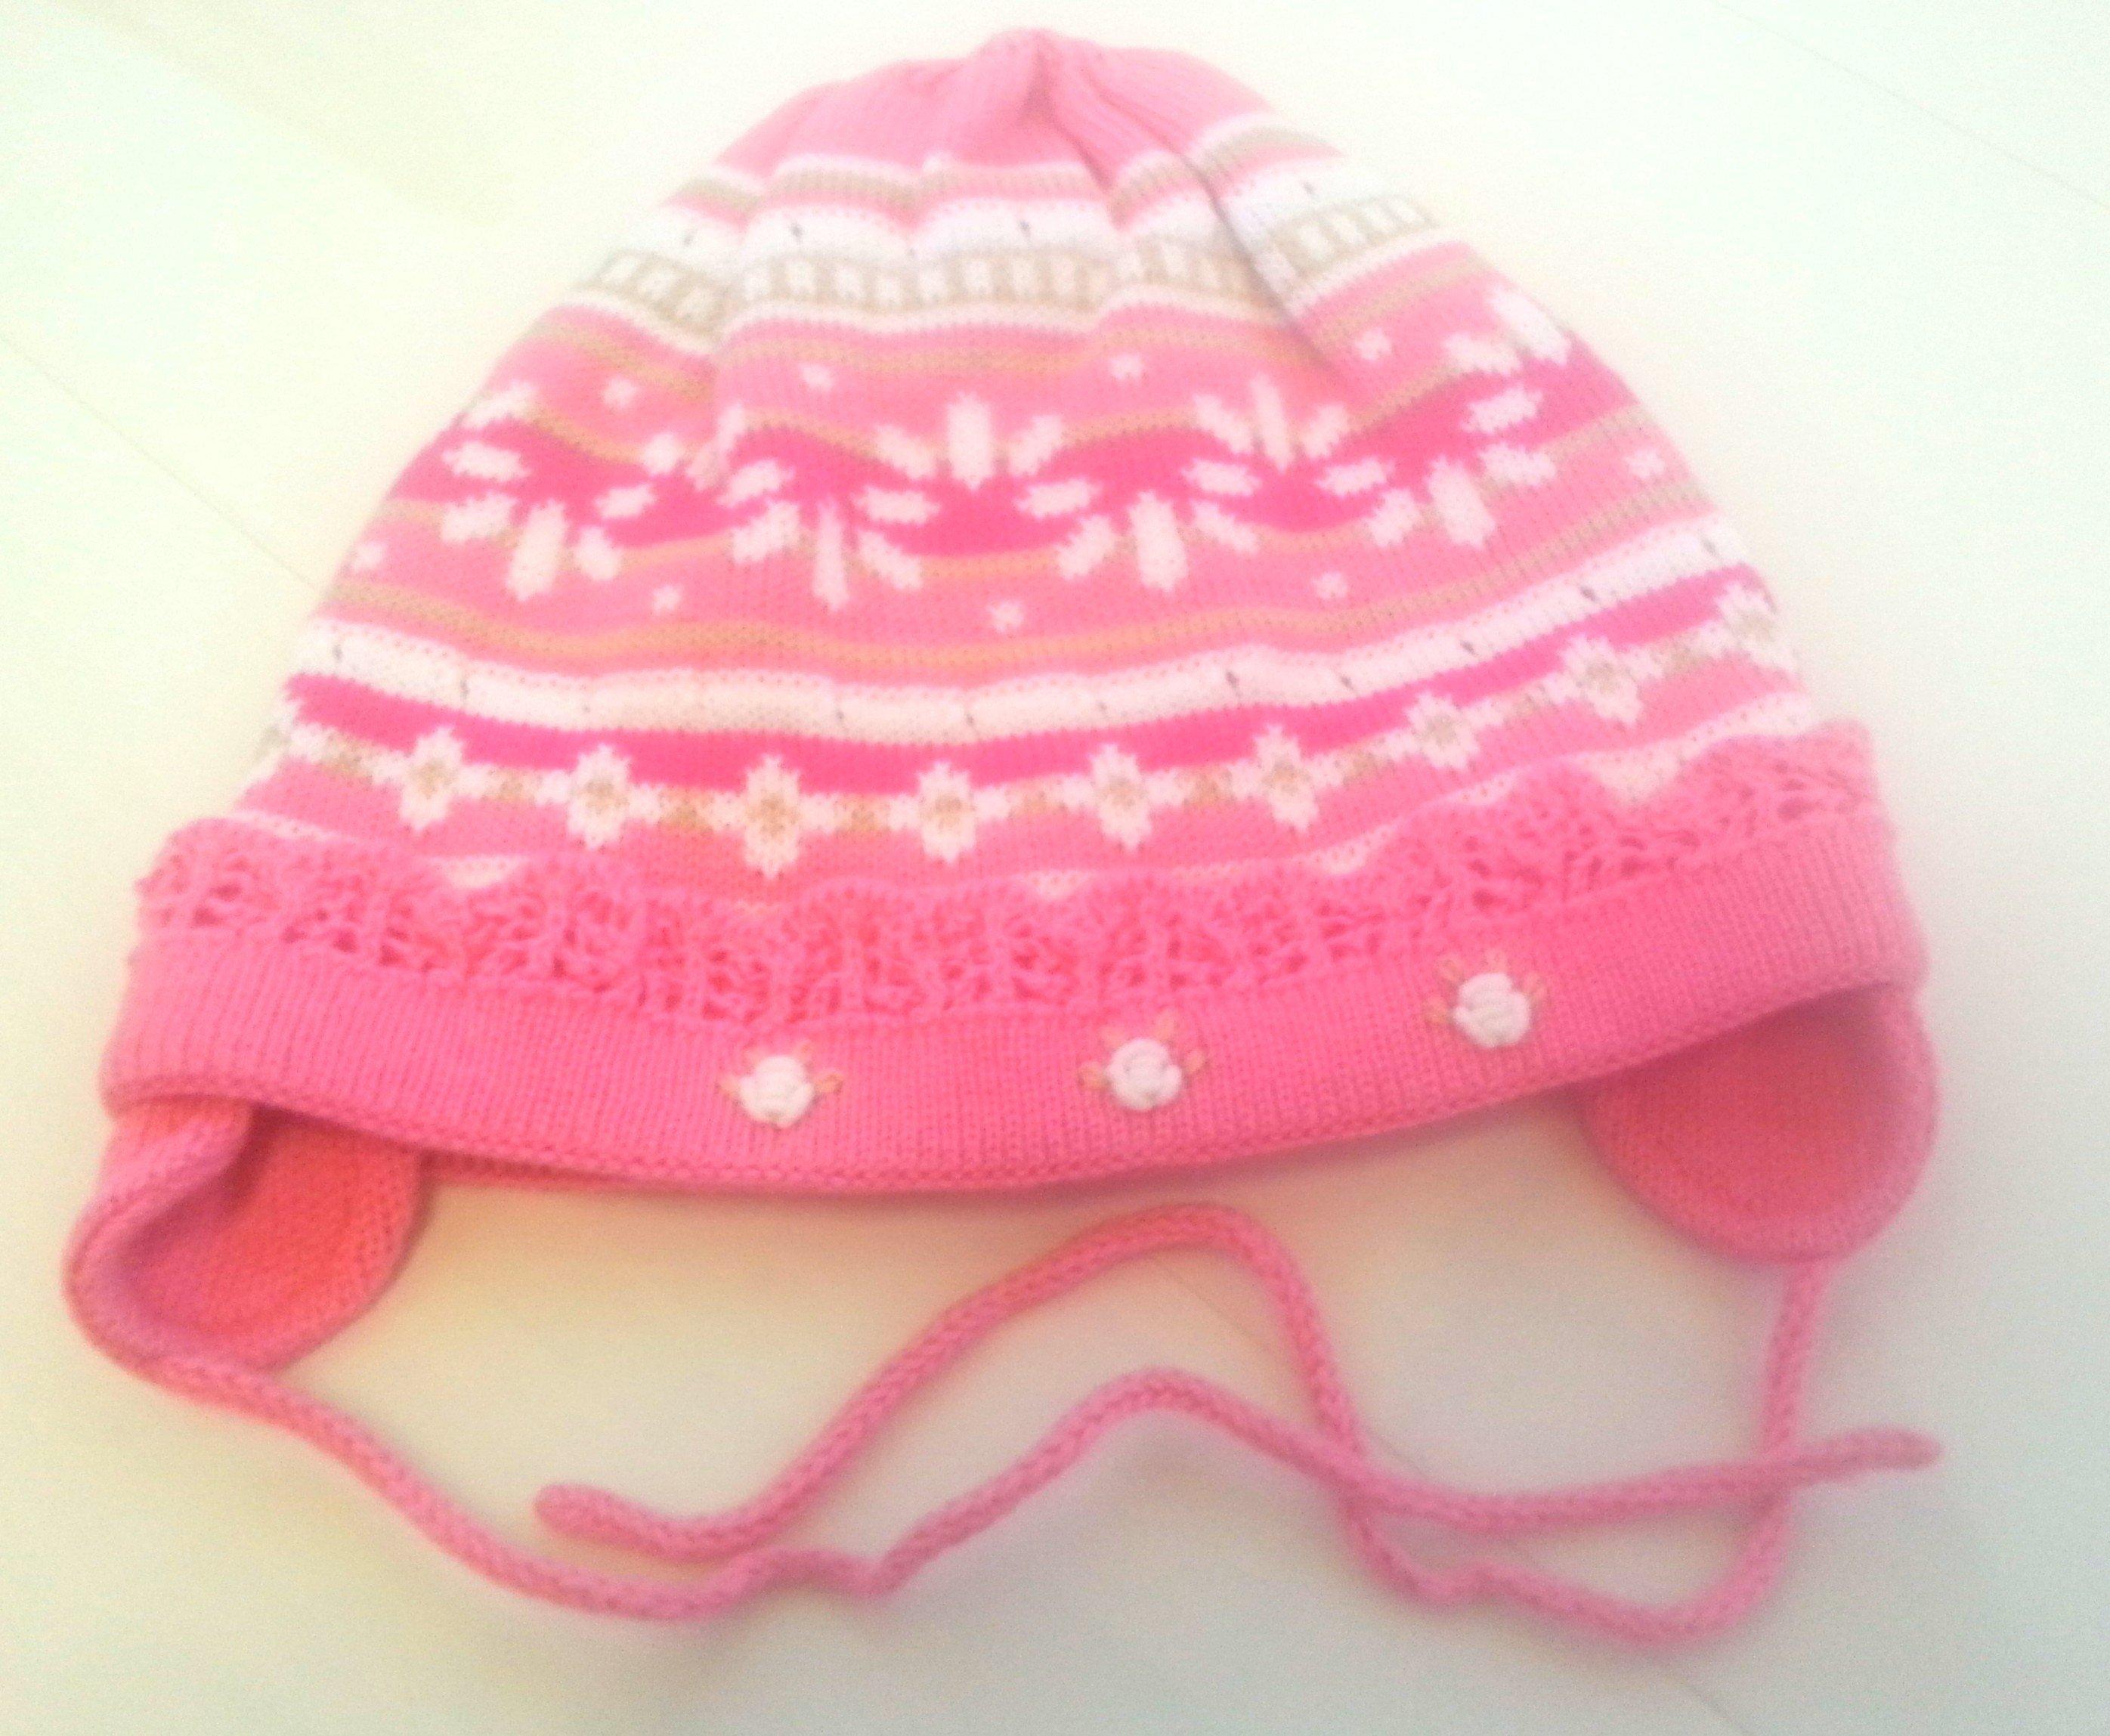 Lenne'15 - Dalia 15242-127 Knitted cap Mazuļu adīta kovilnas cepure sasienamā